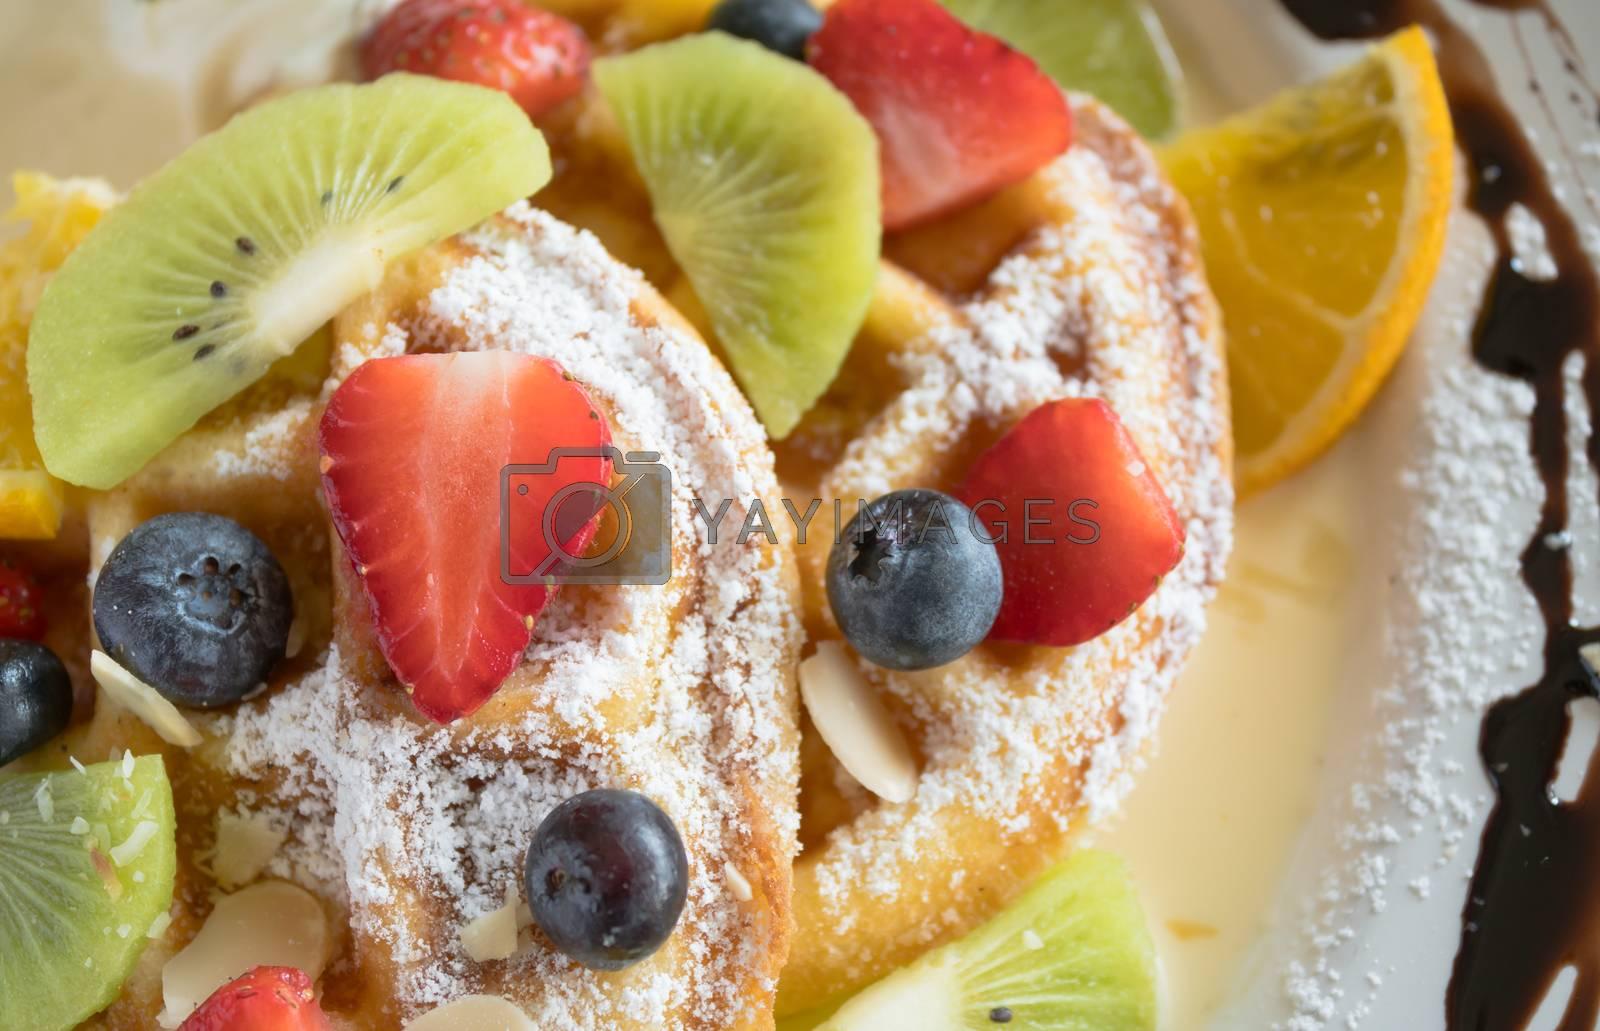 Flatlay Half Strawberry Blueberry Kiwi Lemon Waffle Chocolate Dessert Close Up. Fruity dessert food and drink category